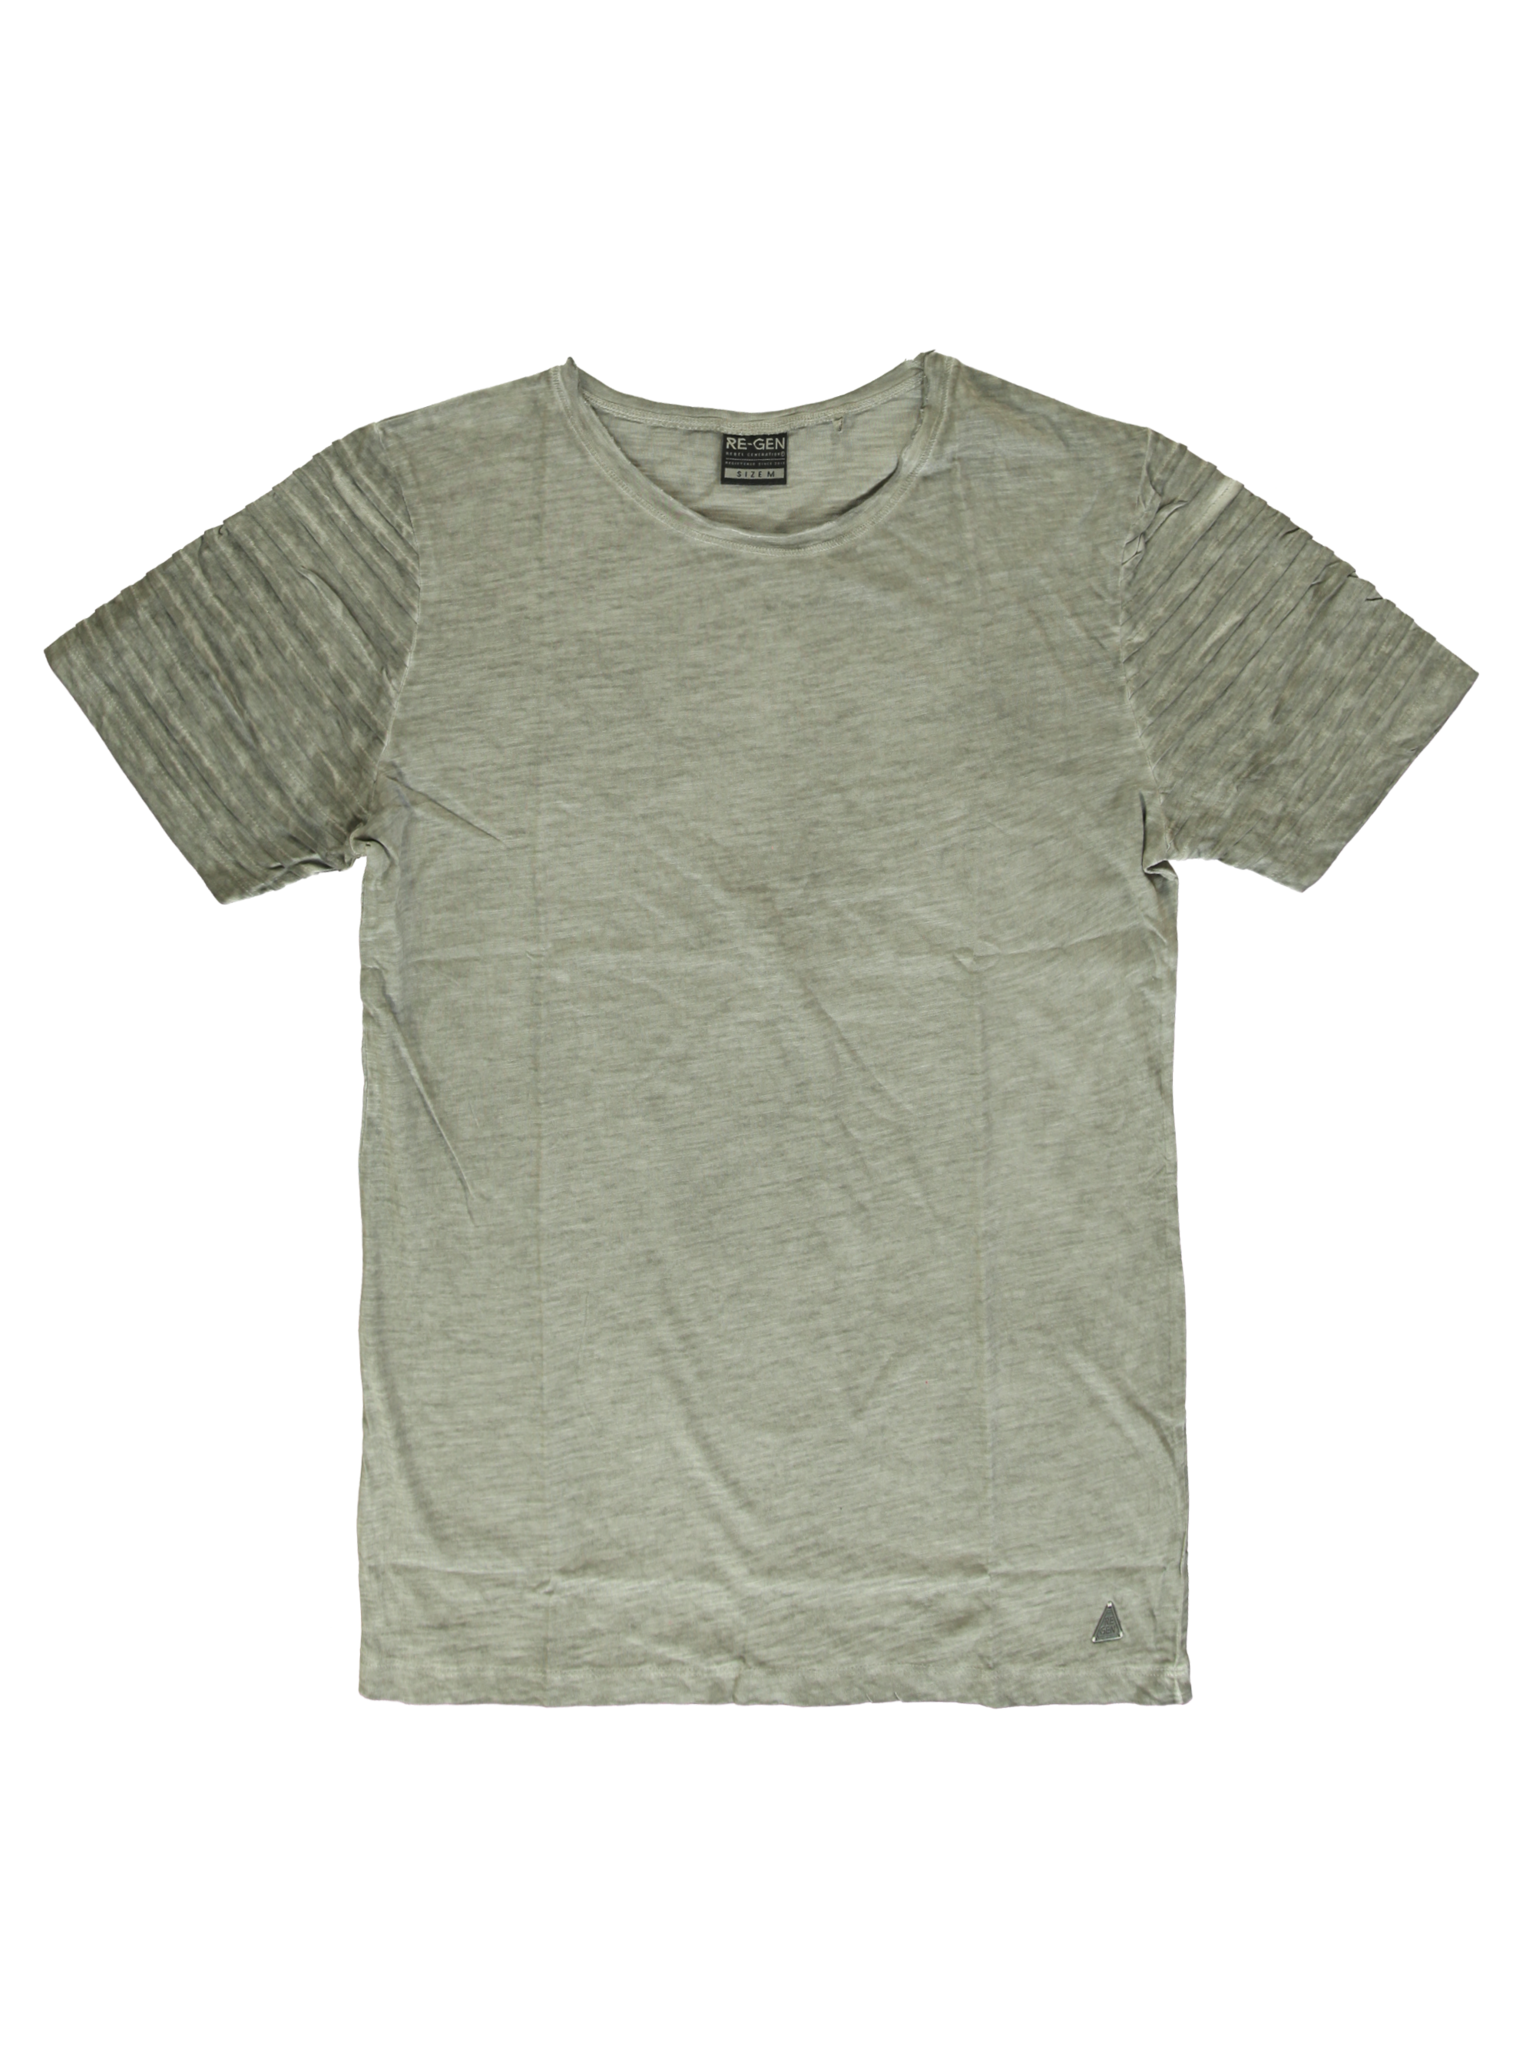 All Brands | Winterproducts Men | T-shirt | 20 pcs/box